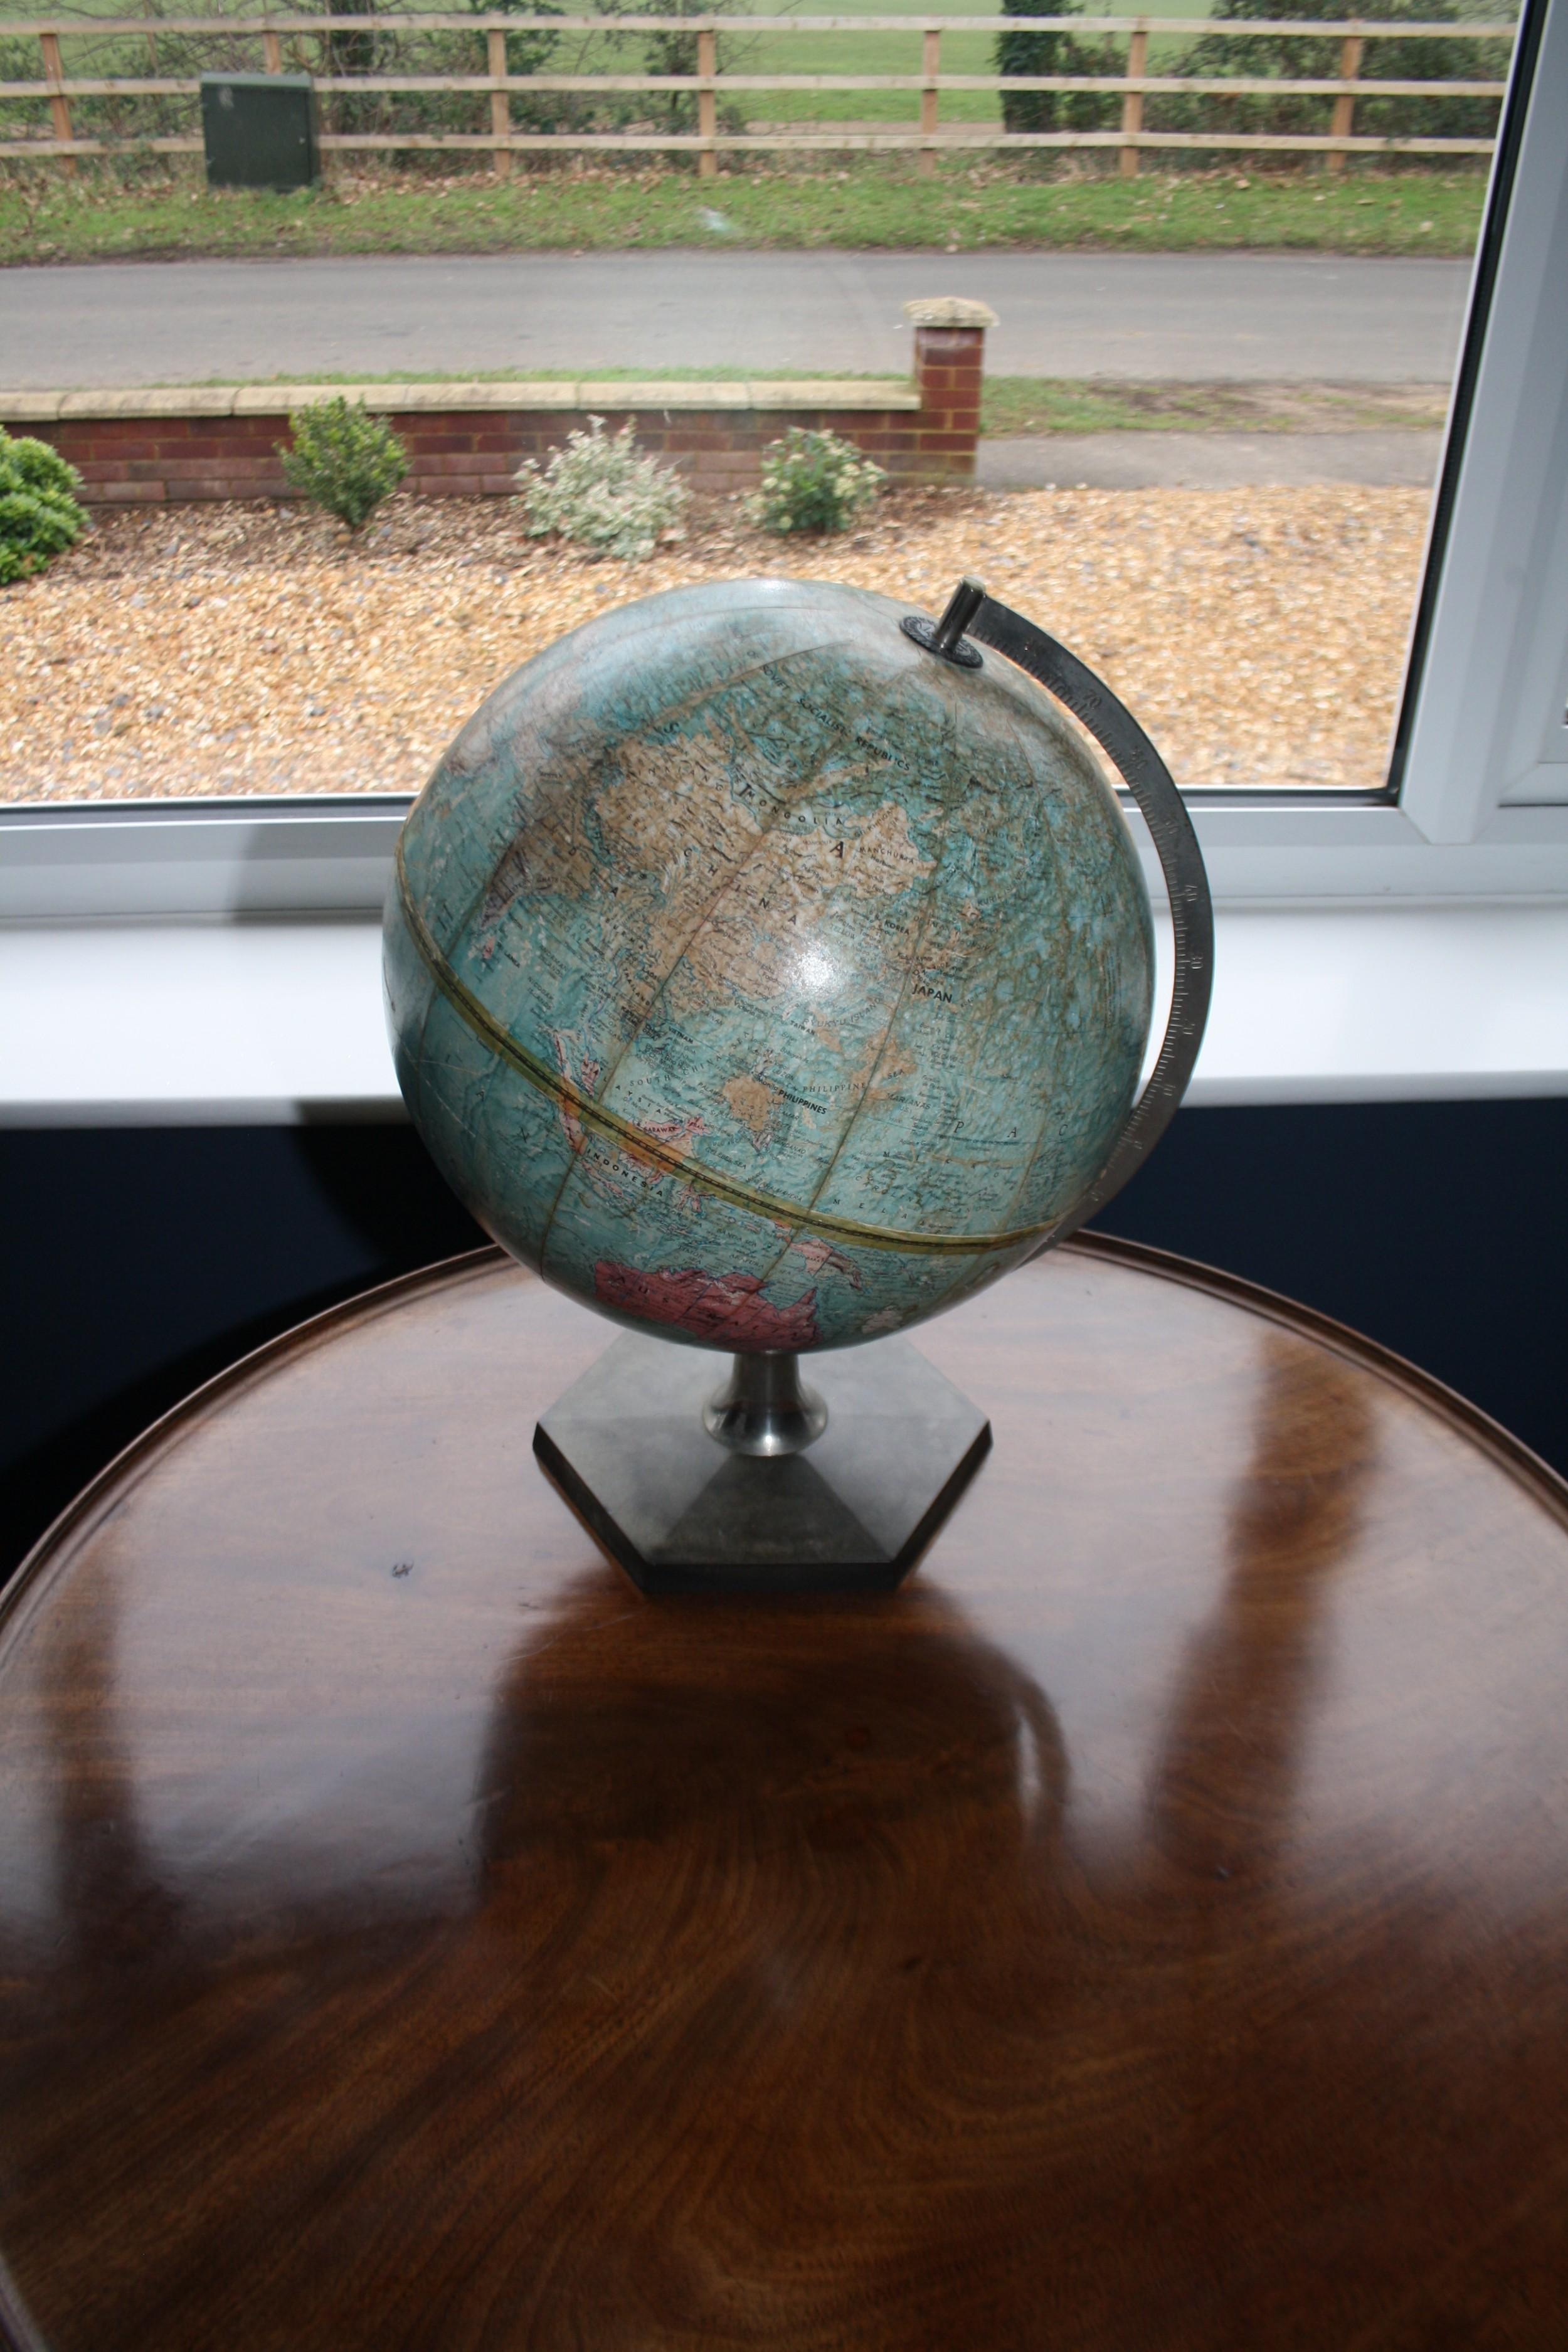 early 20th century globe with bakelite base